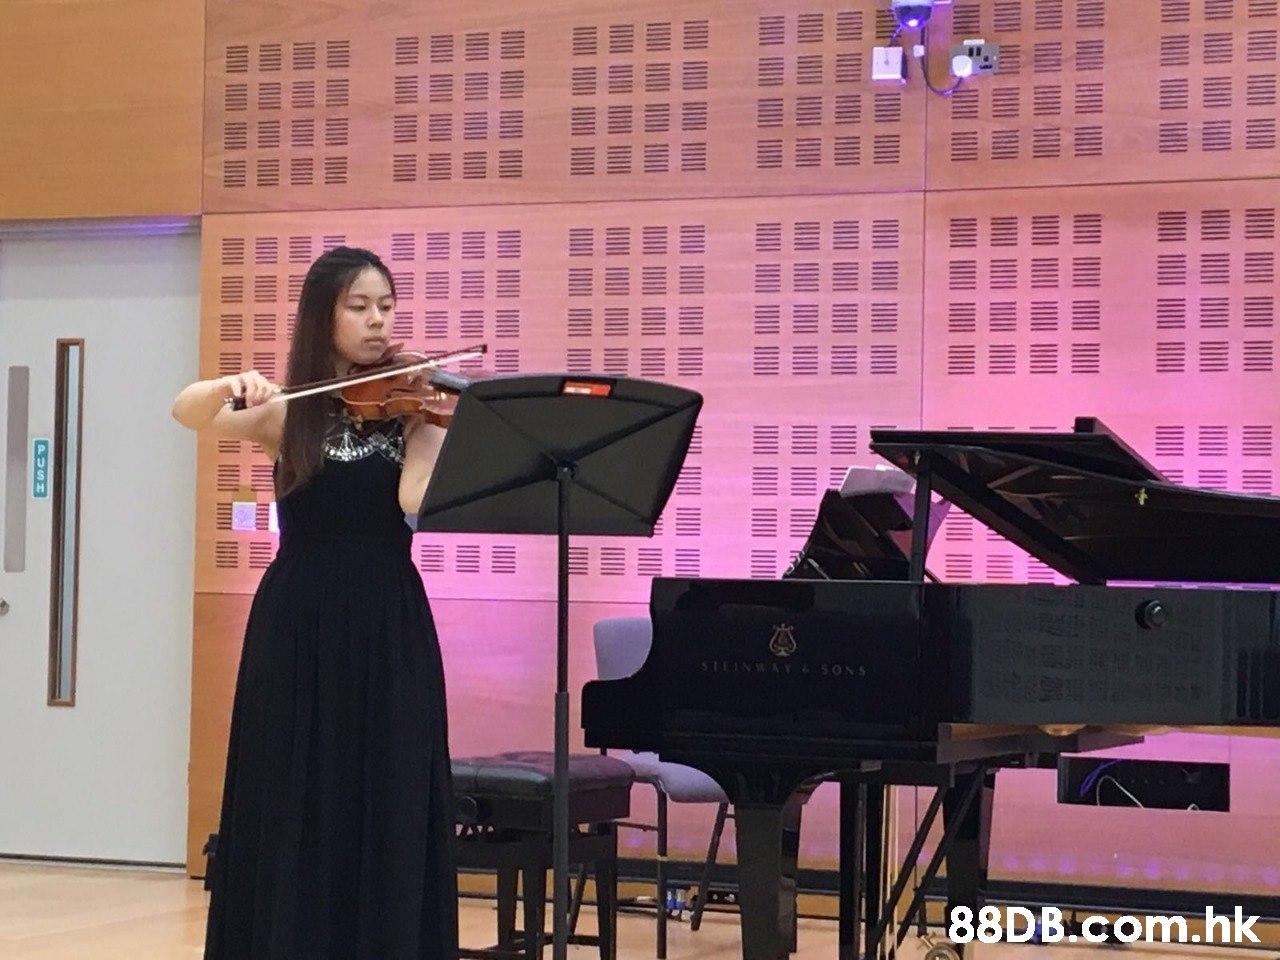 STEINWAY&SONS FATA .hk PUSH  Recital,Music,Musician,Pianist,Musical instrument